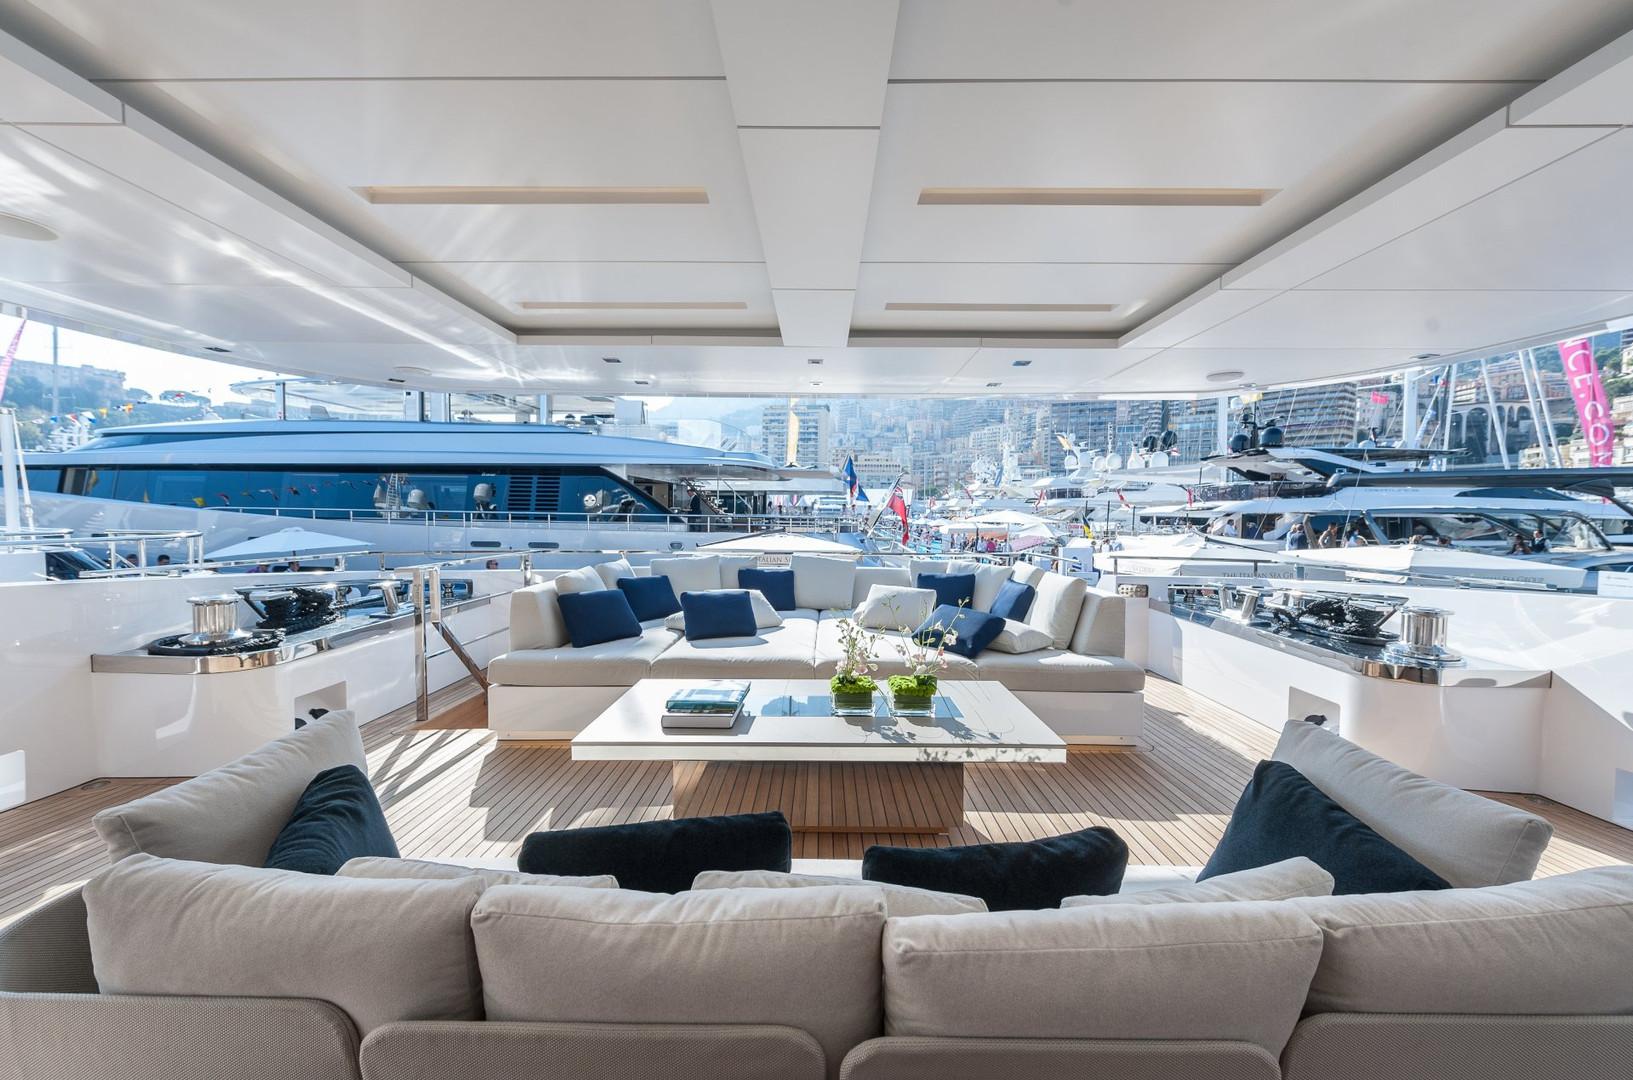 Yacht ENTOURAGE - aft deck